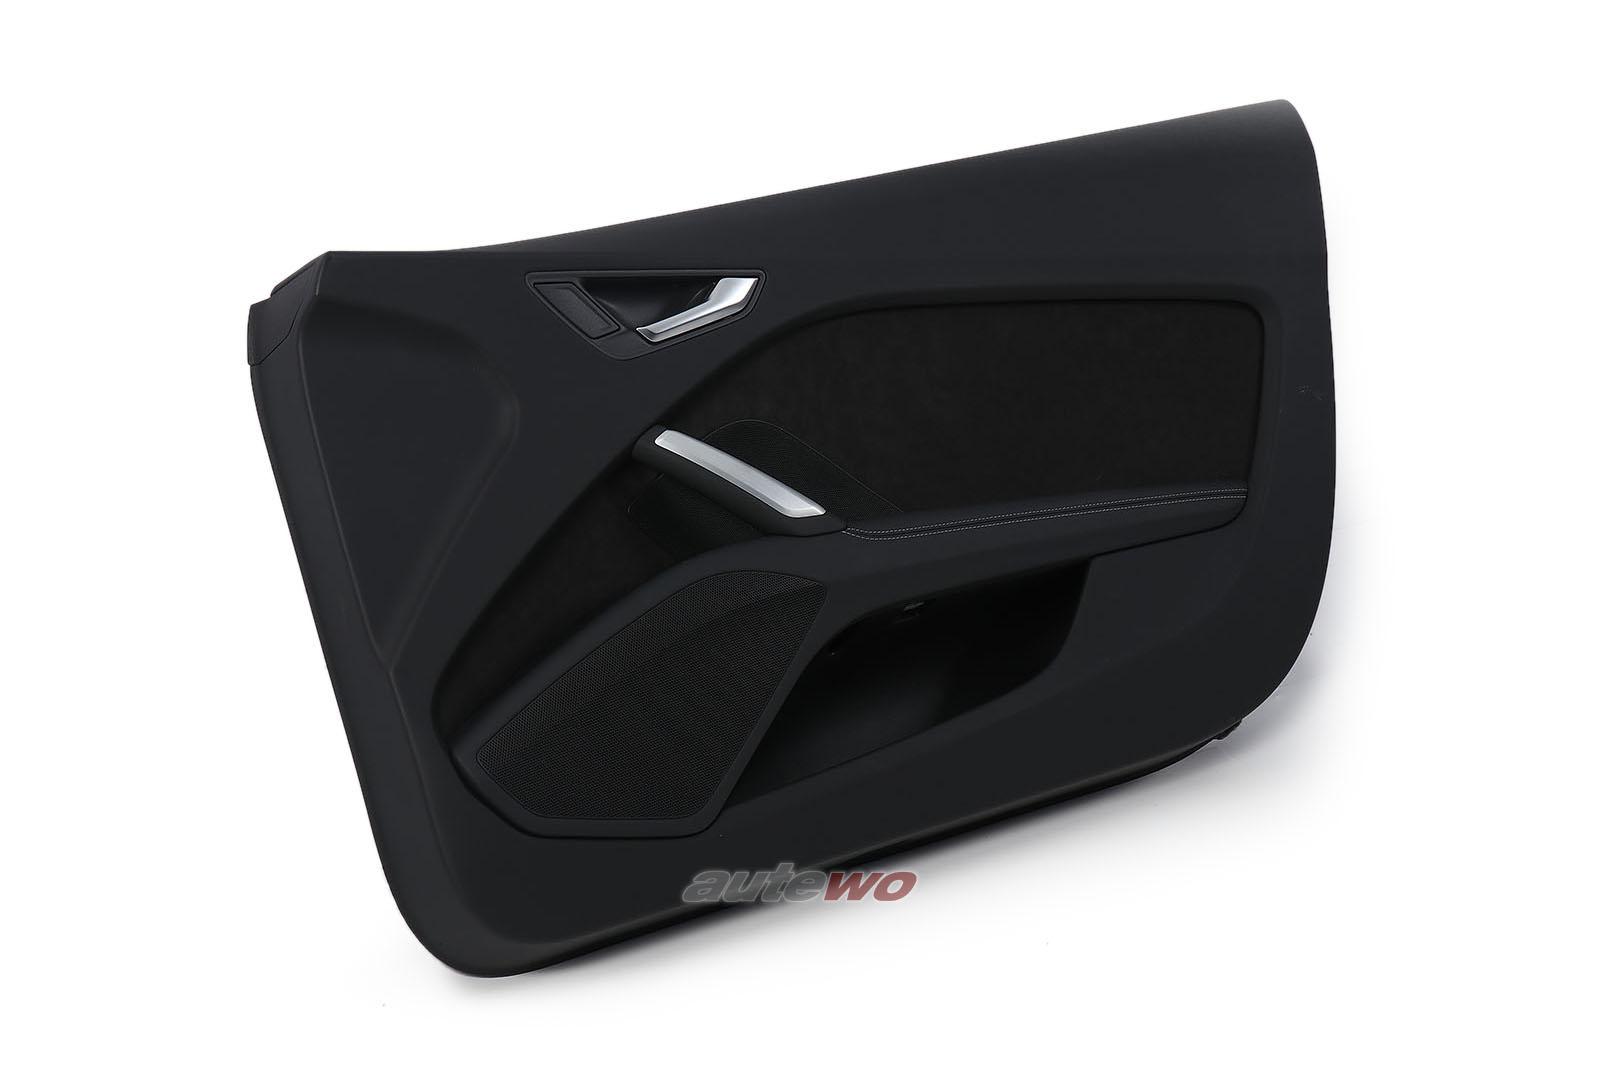 8S0867104C Audi TT/TTS 8S/FV Türverkleidung Leder/Alcantara schwarz Rechts